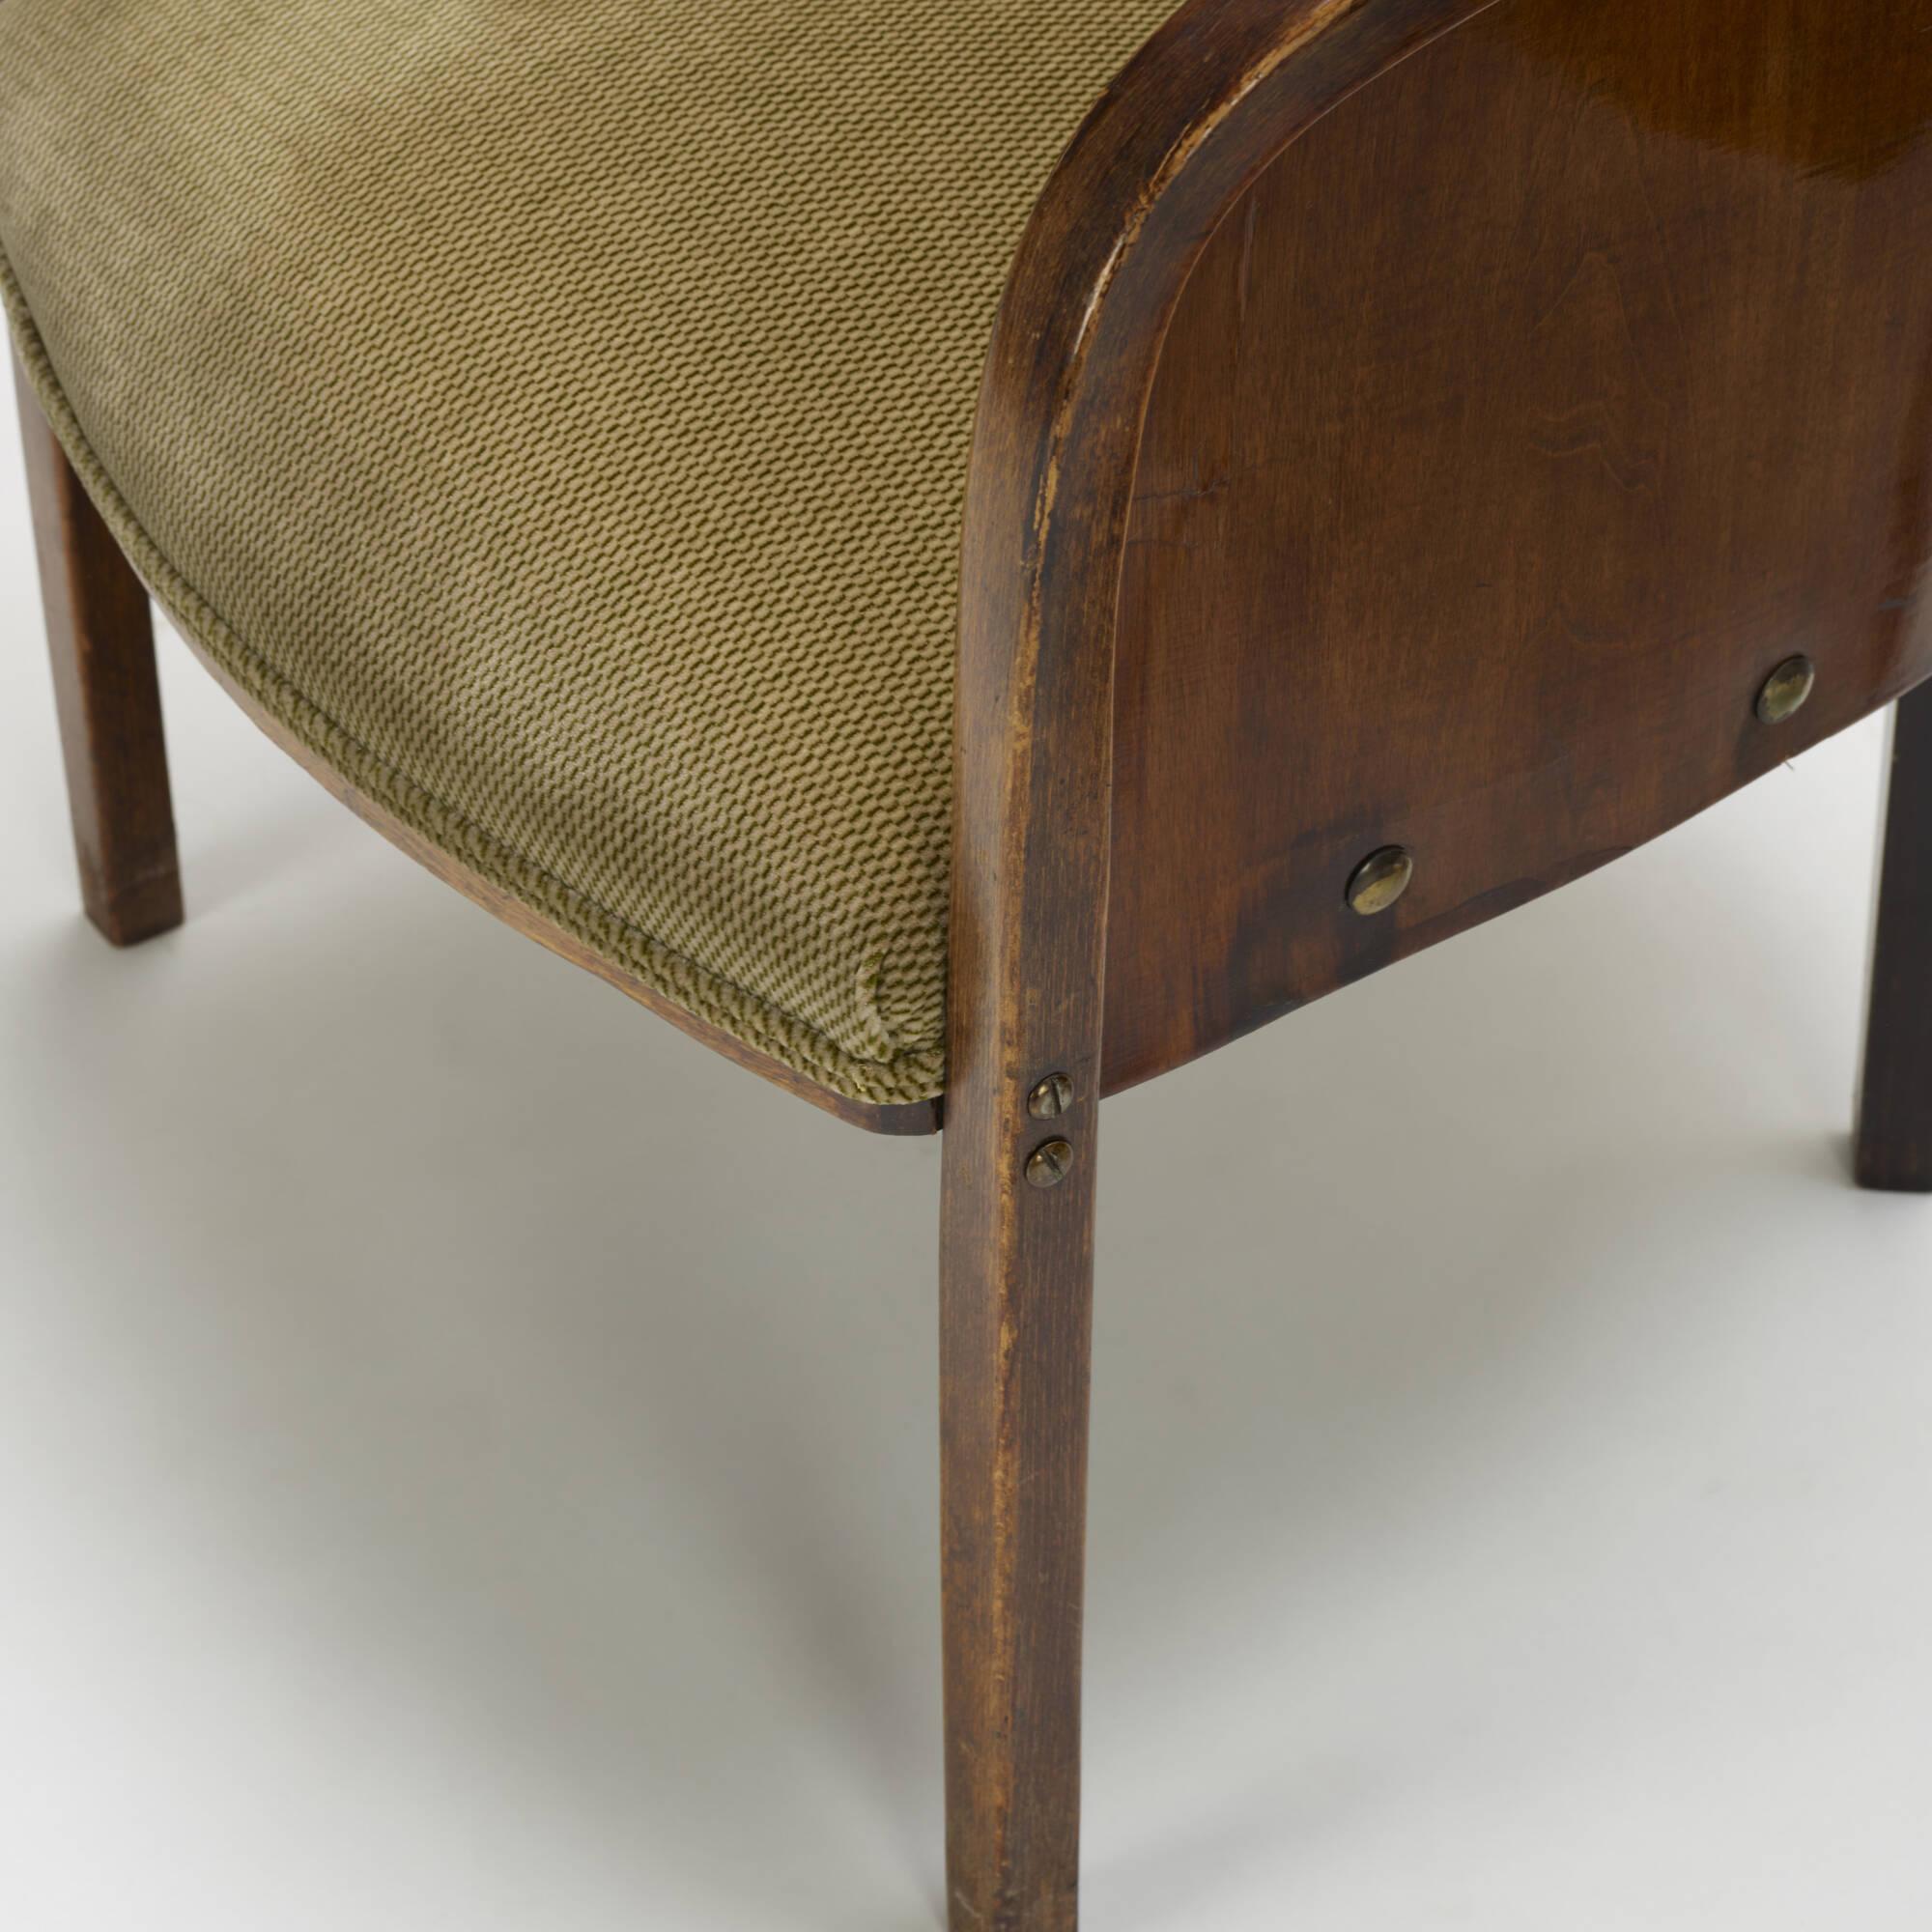 160: J. & J. Kohn / armchairs model W795, pair (3 of 3)